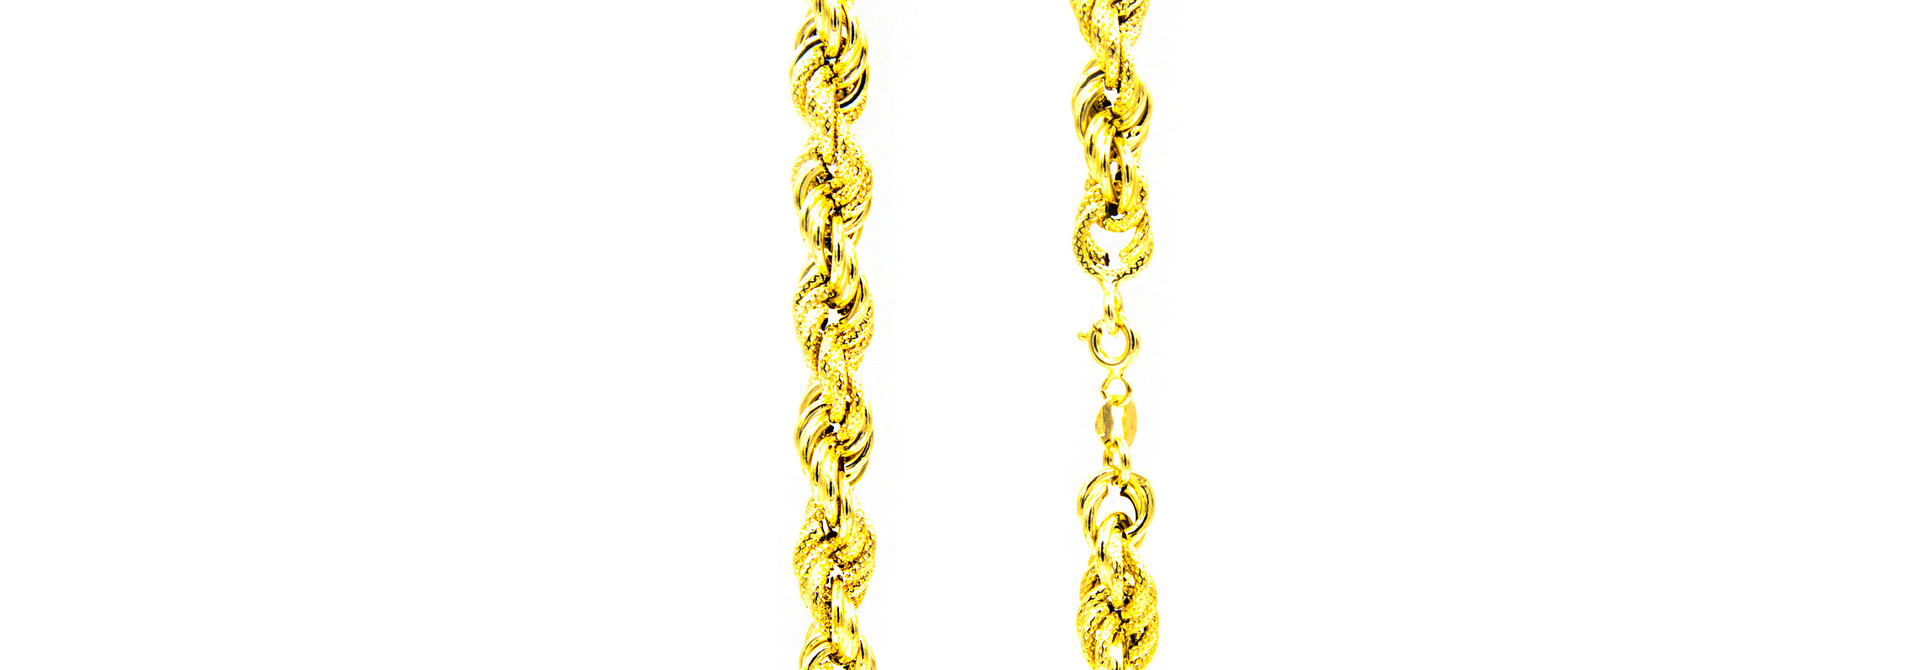 Ketting rope chain gedeeltelijk diamond cut